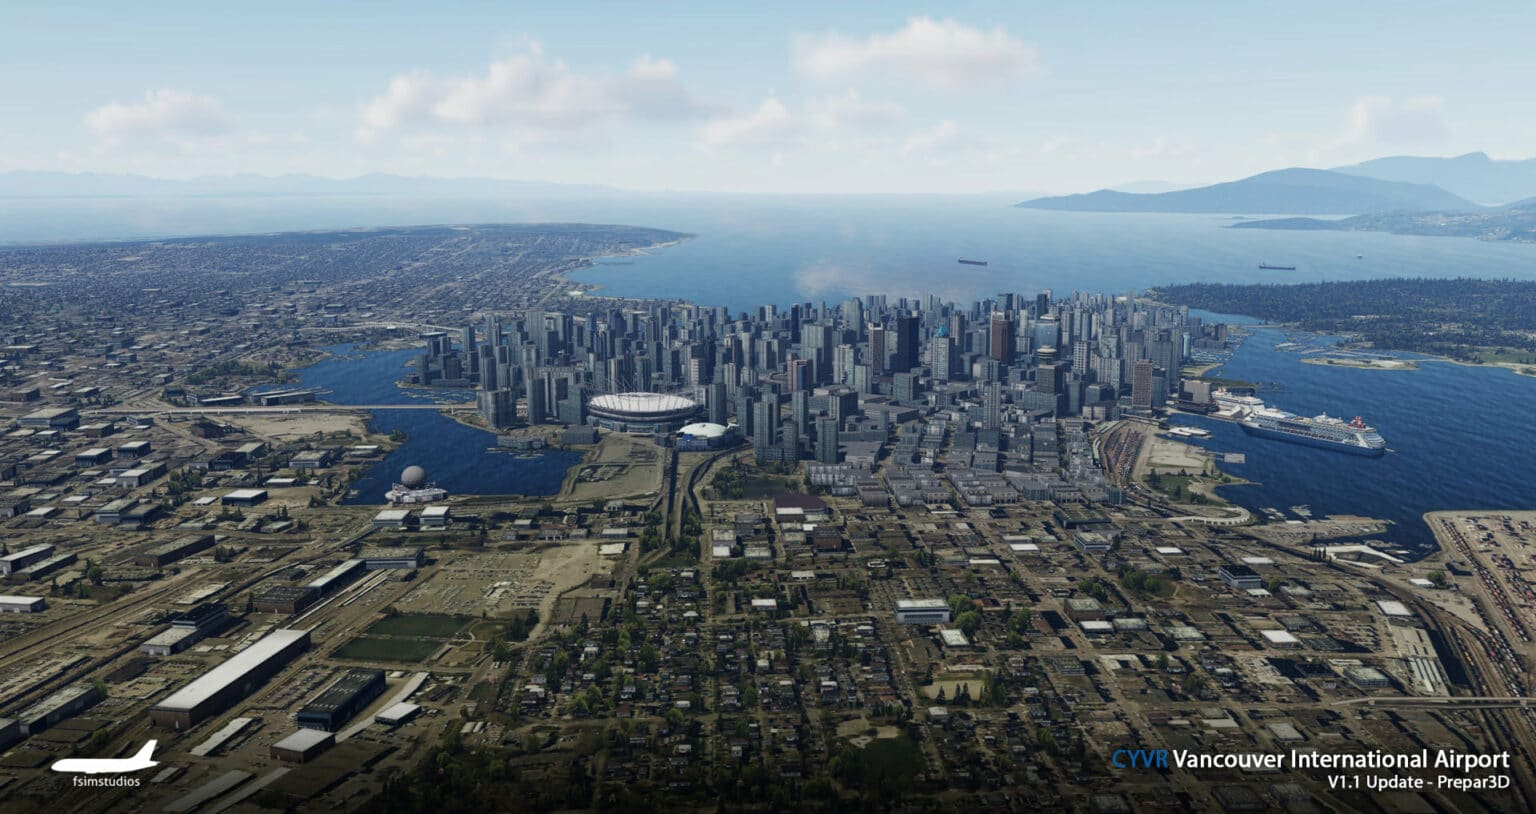 FSimstudio_Vancouver (1)